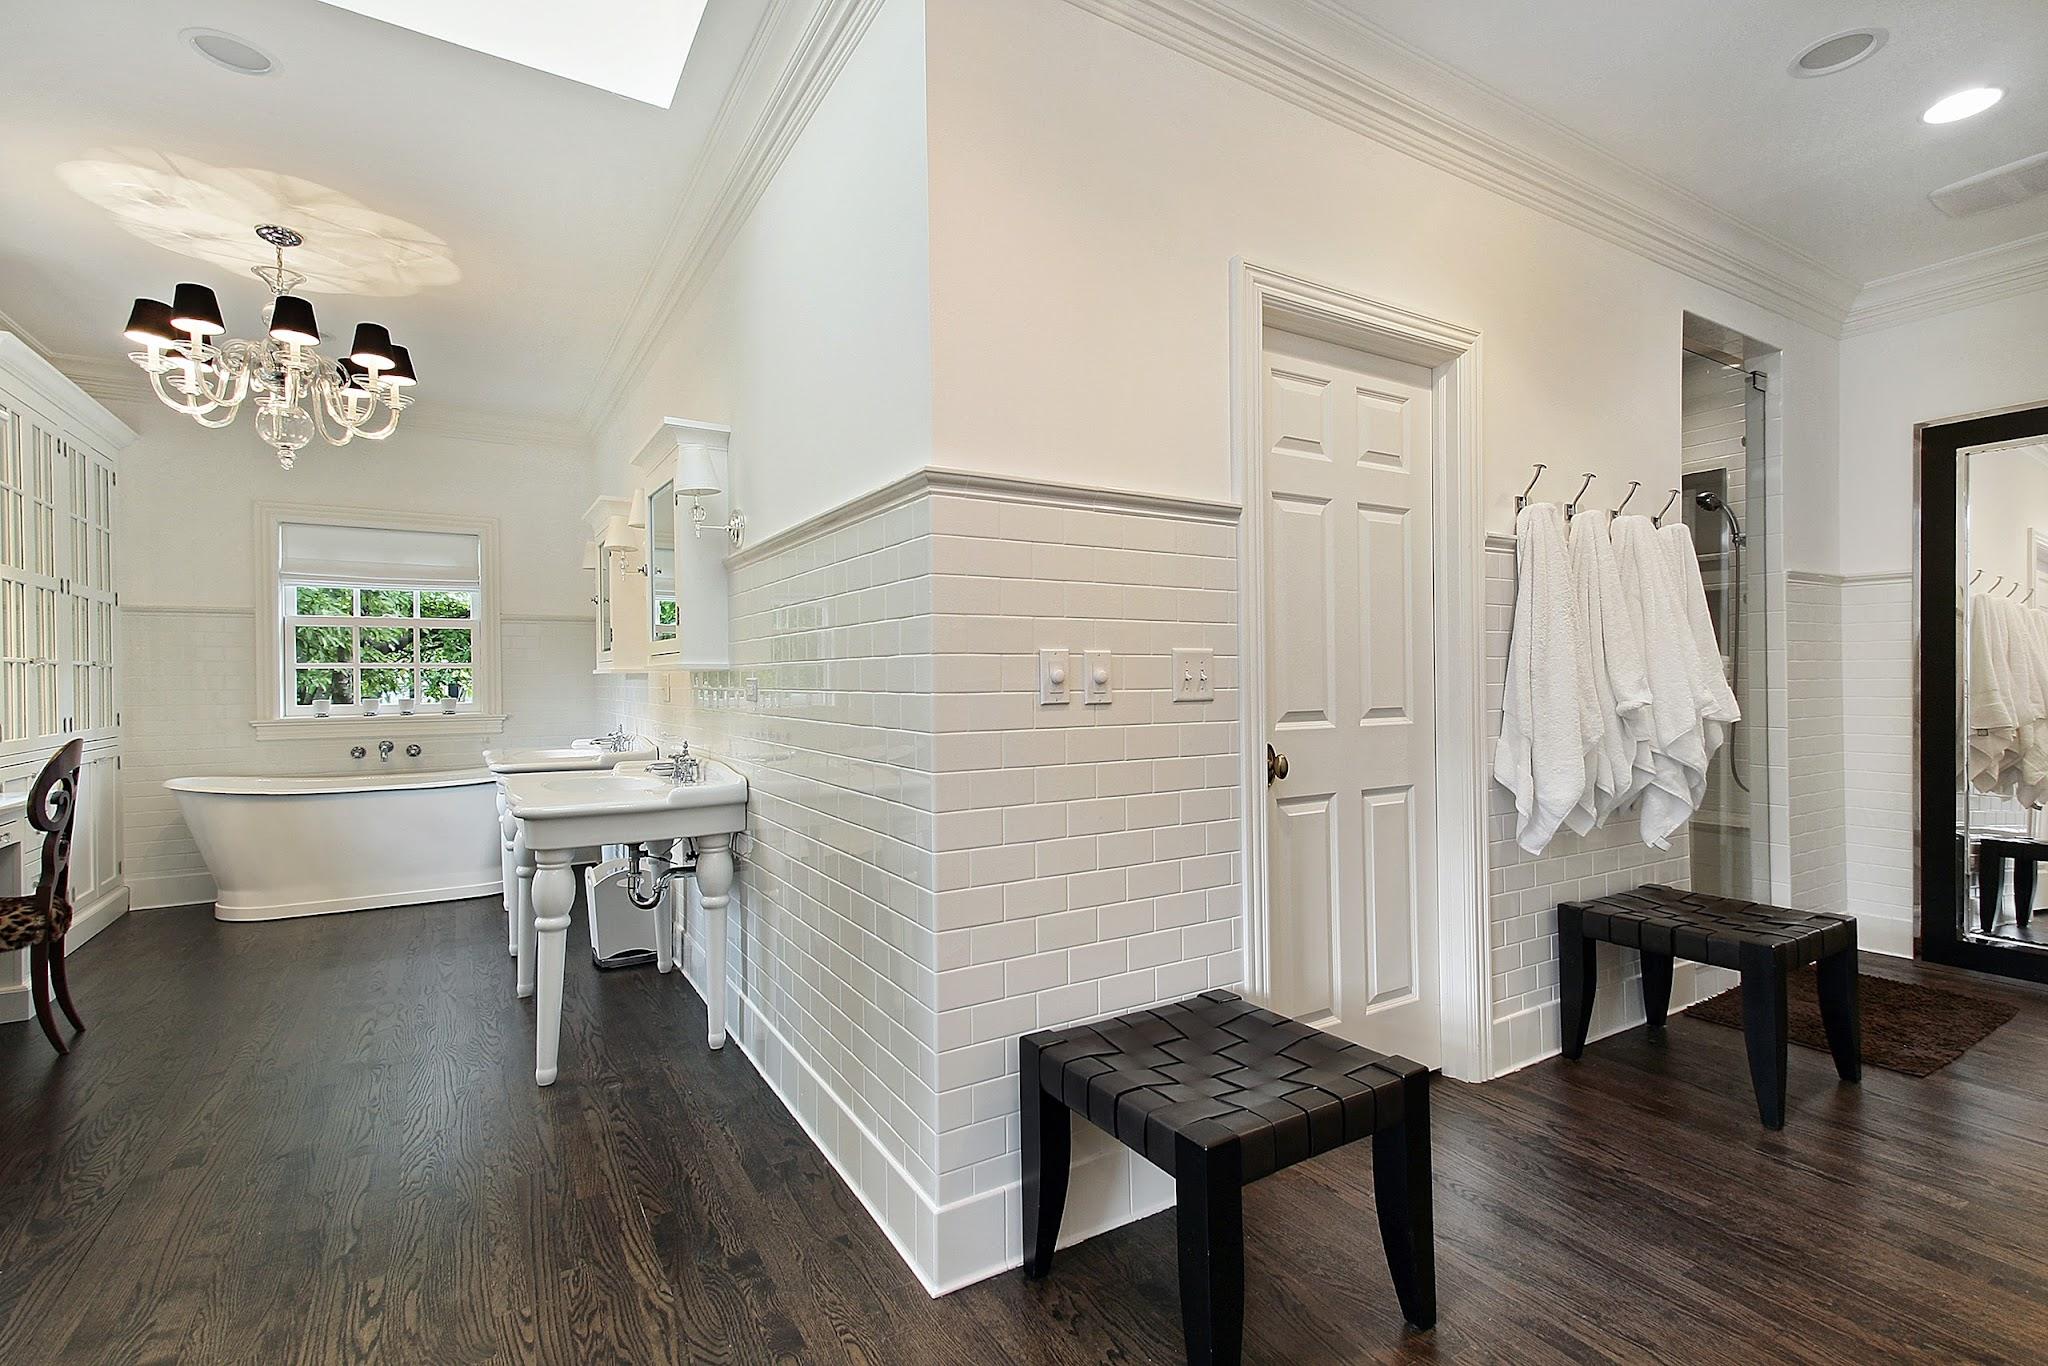 Cape Cod Architect & Builder - Bathroom Design Project Gallery